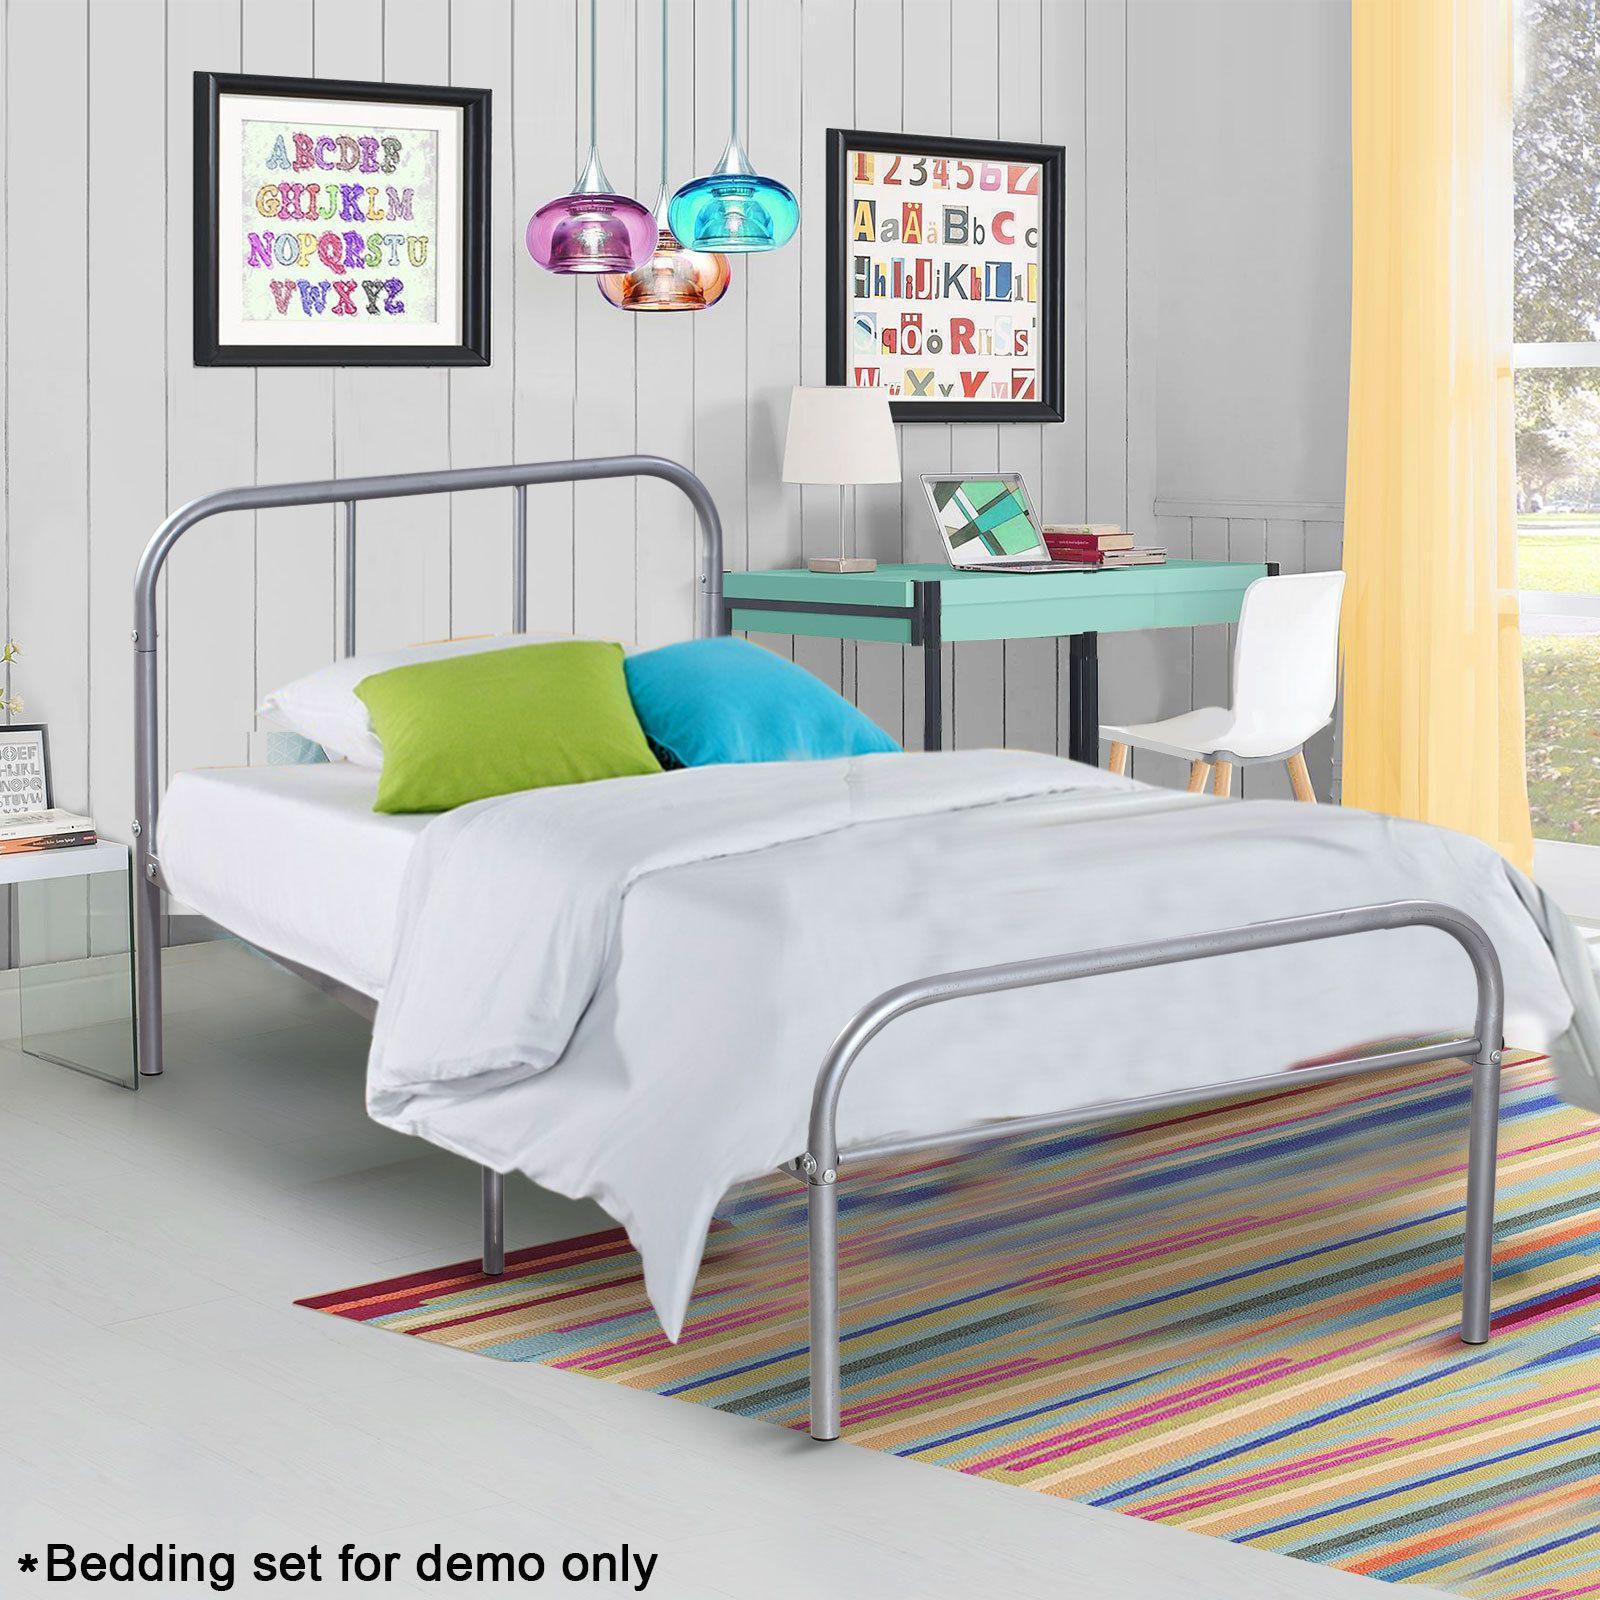 Details about Twin Size Metal Platform Bed Frame Mattress